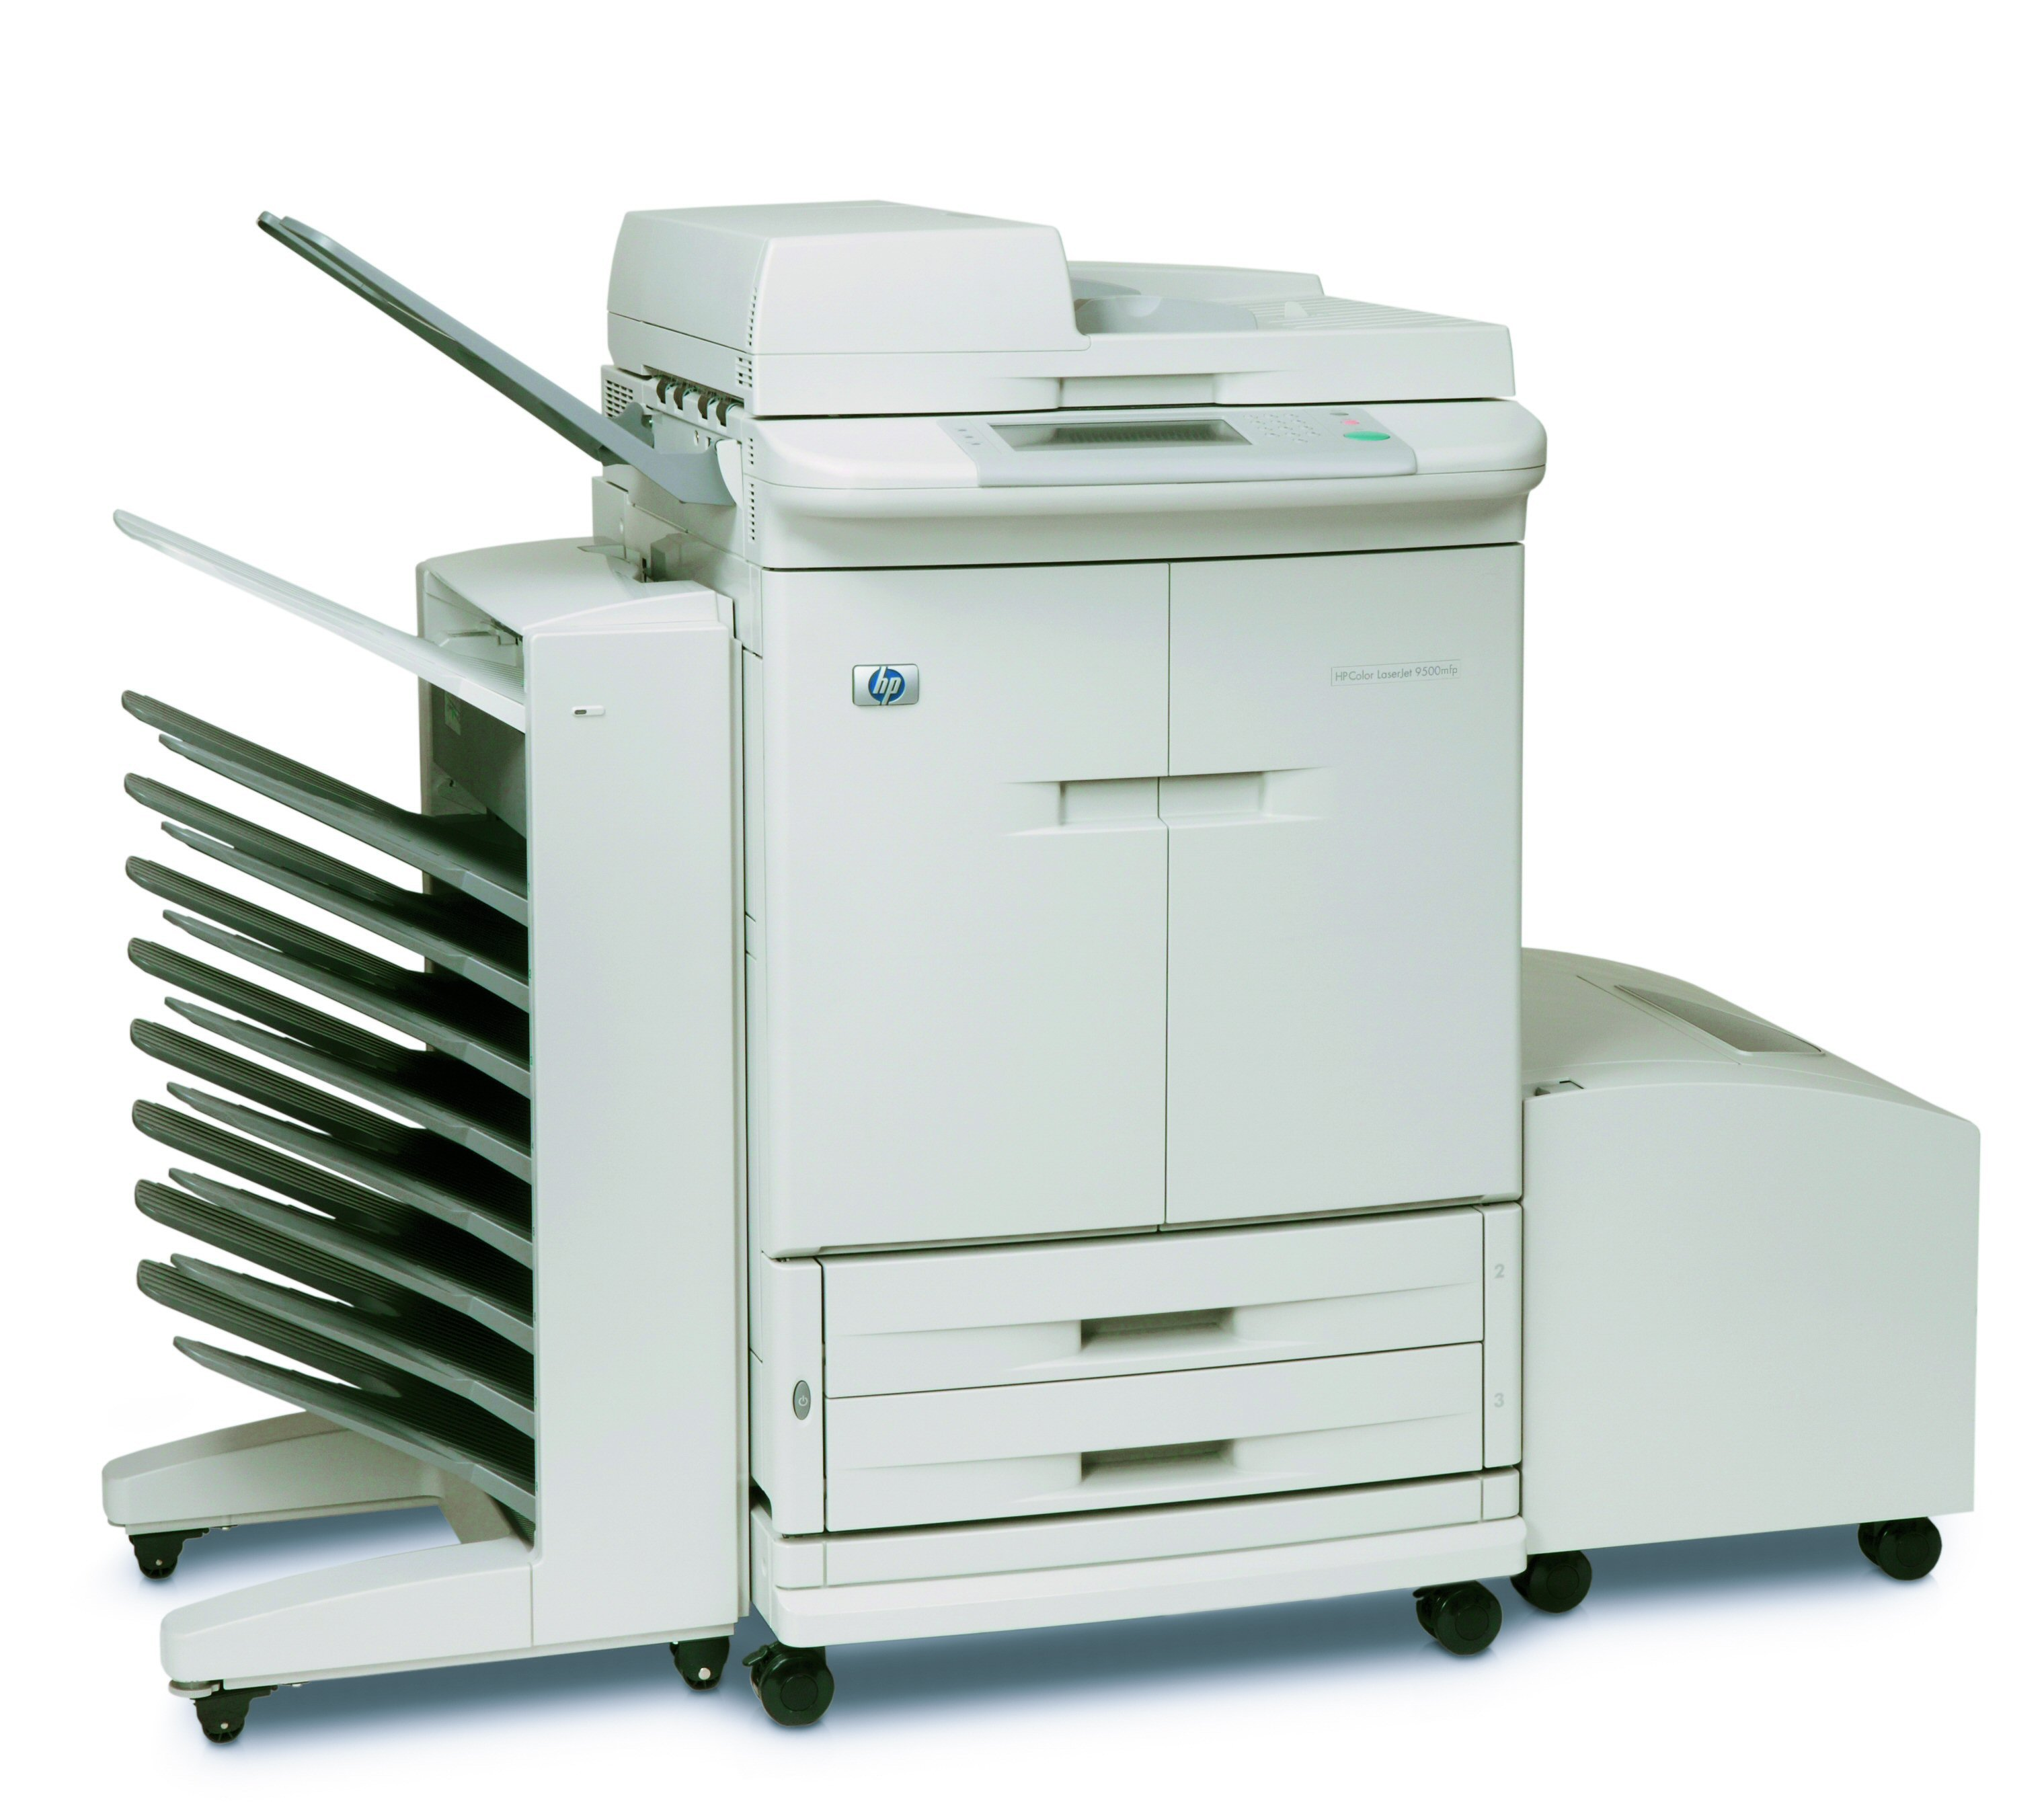 hp color laserjet 9500mfp refurbexperts